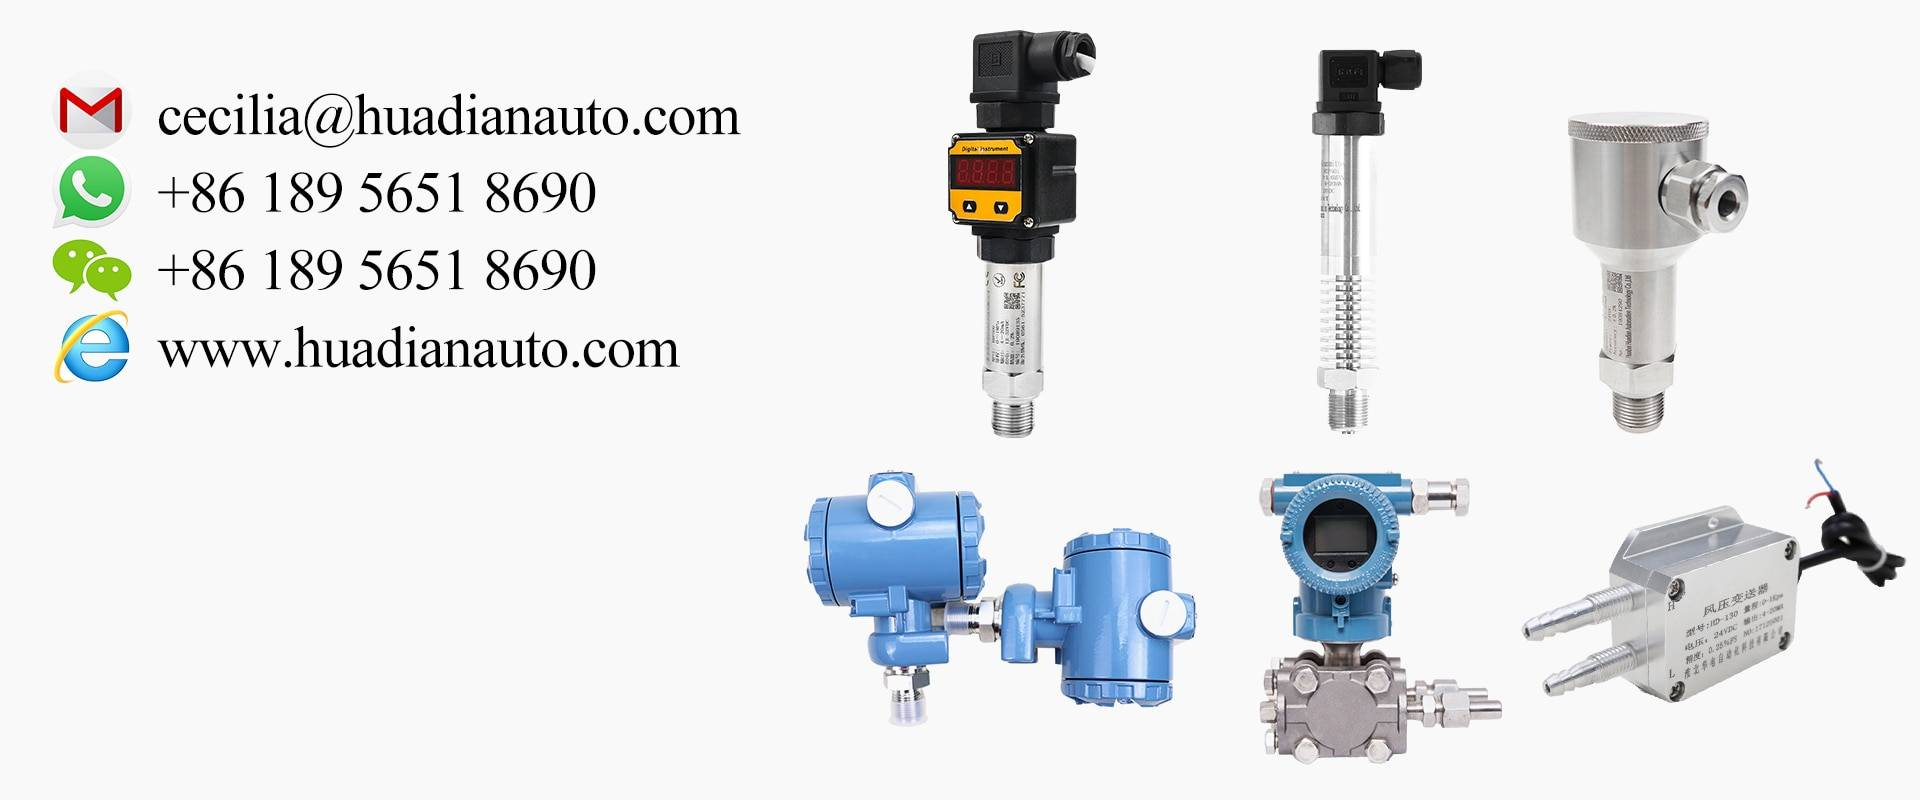 oil pressure sensor 4-20mA Pressure Transmitter G1/2 Hirschmann connector